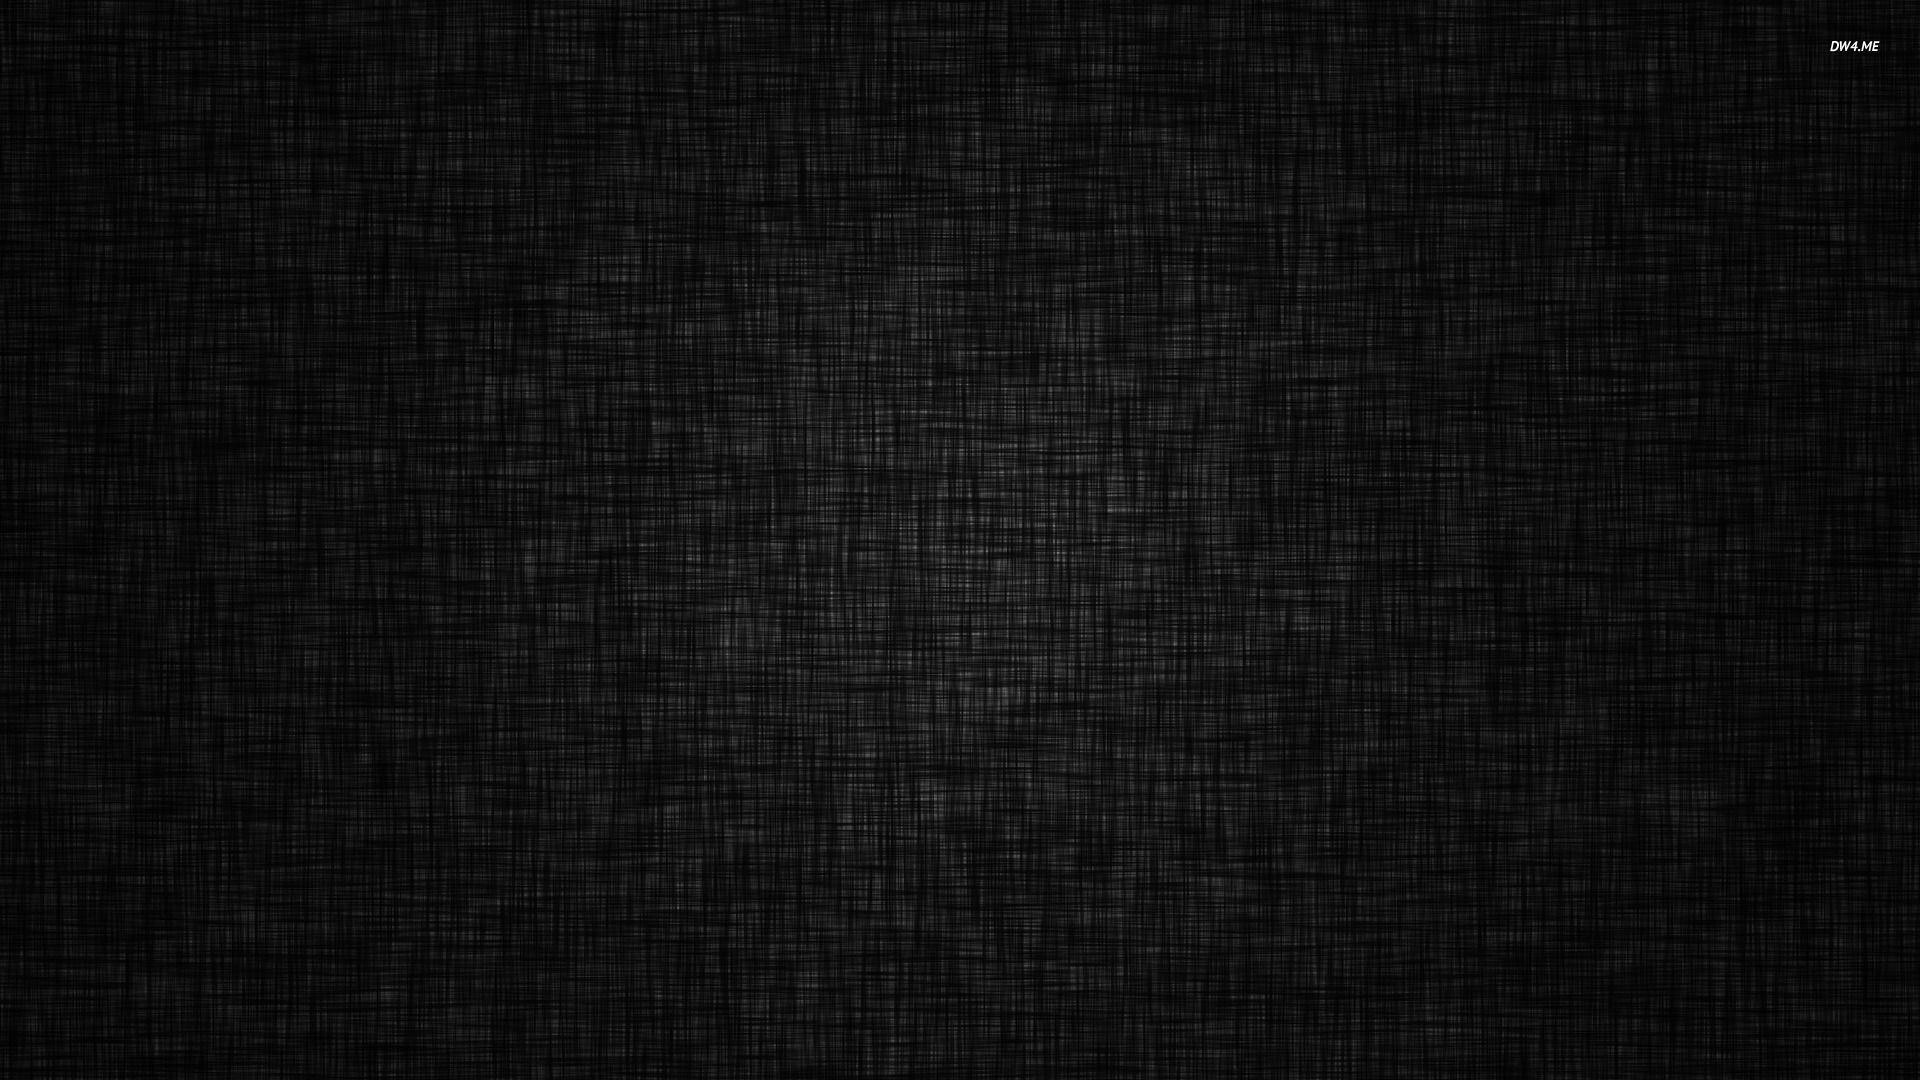 Black Texture Wallpapers Wallpaper Cave